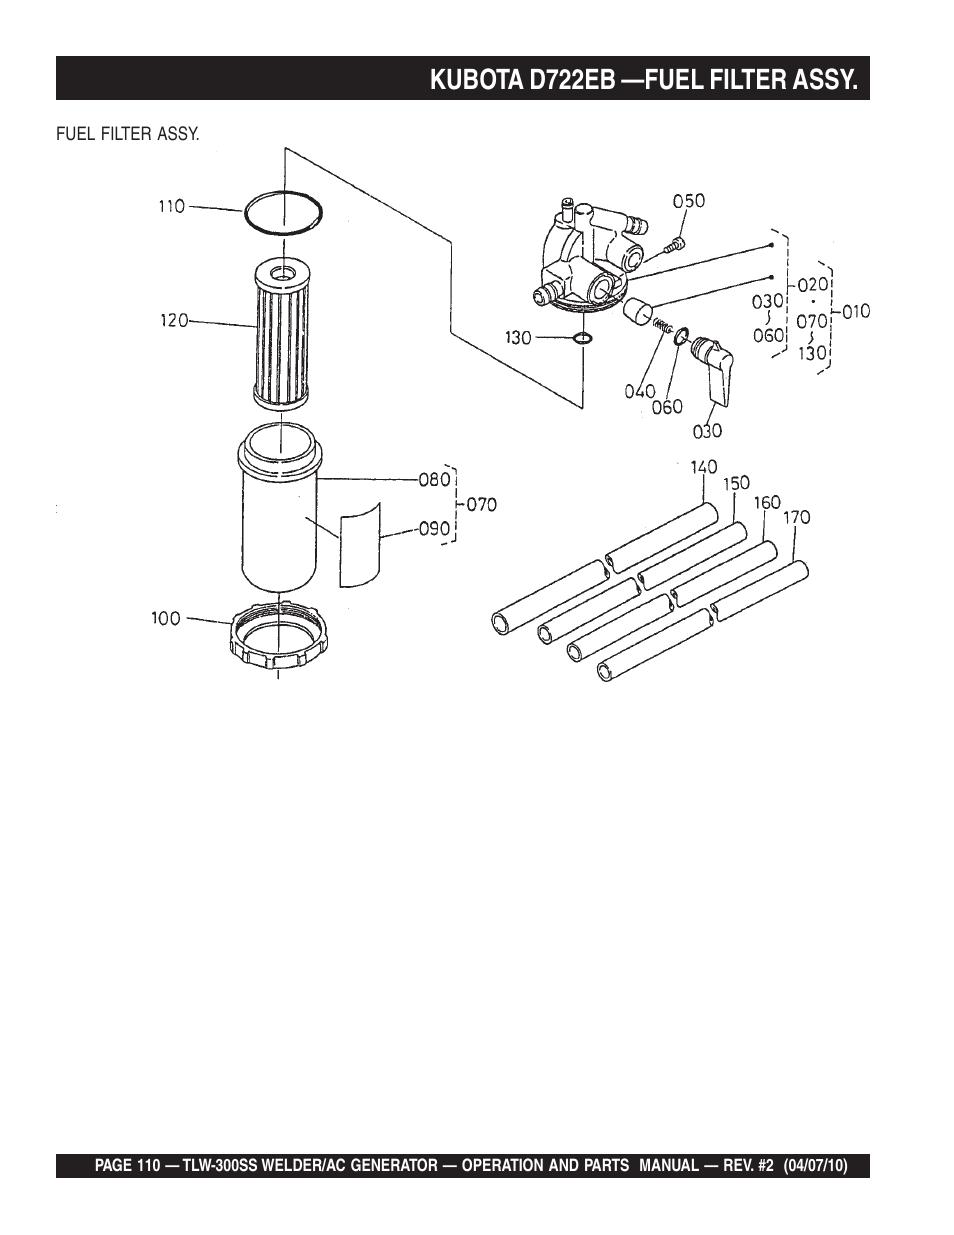 kubota d722eb —fuel filter assy | multiquip mq power whisperweld welder/ac  generator tlw-300ss user manual | page 110 / 138